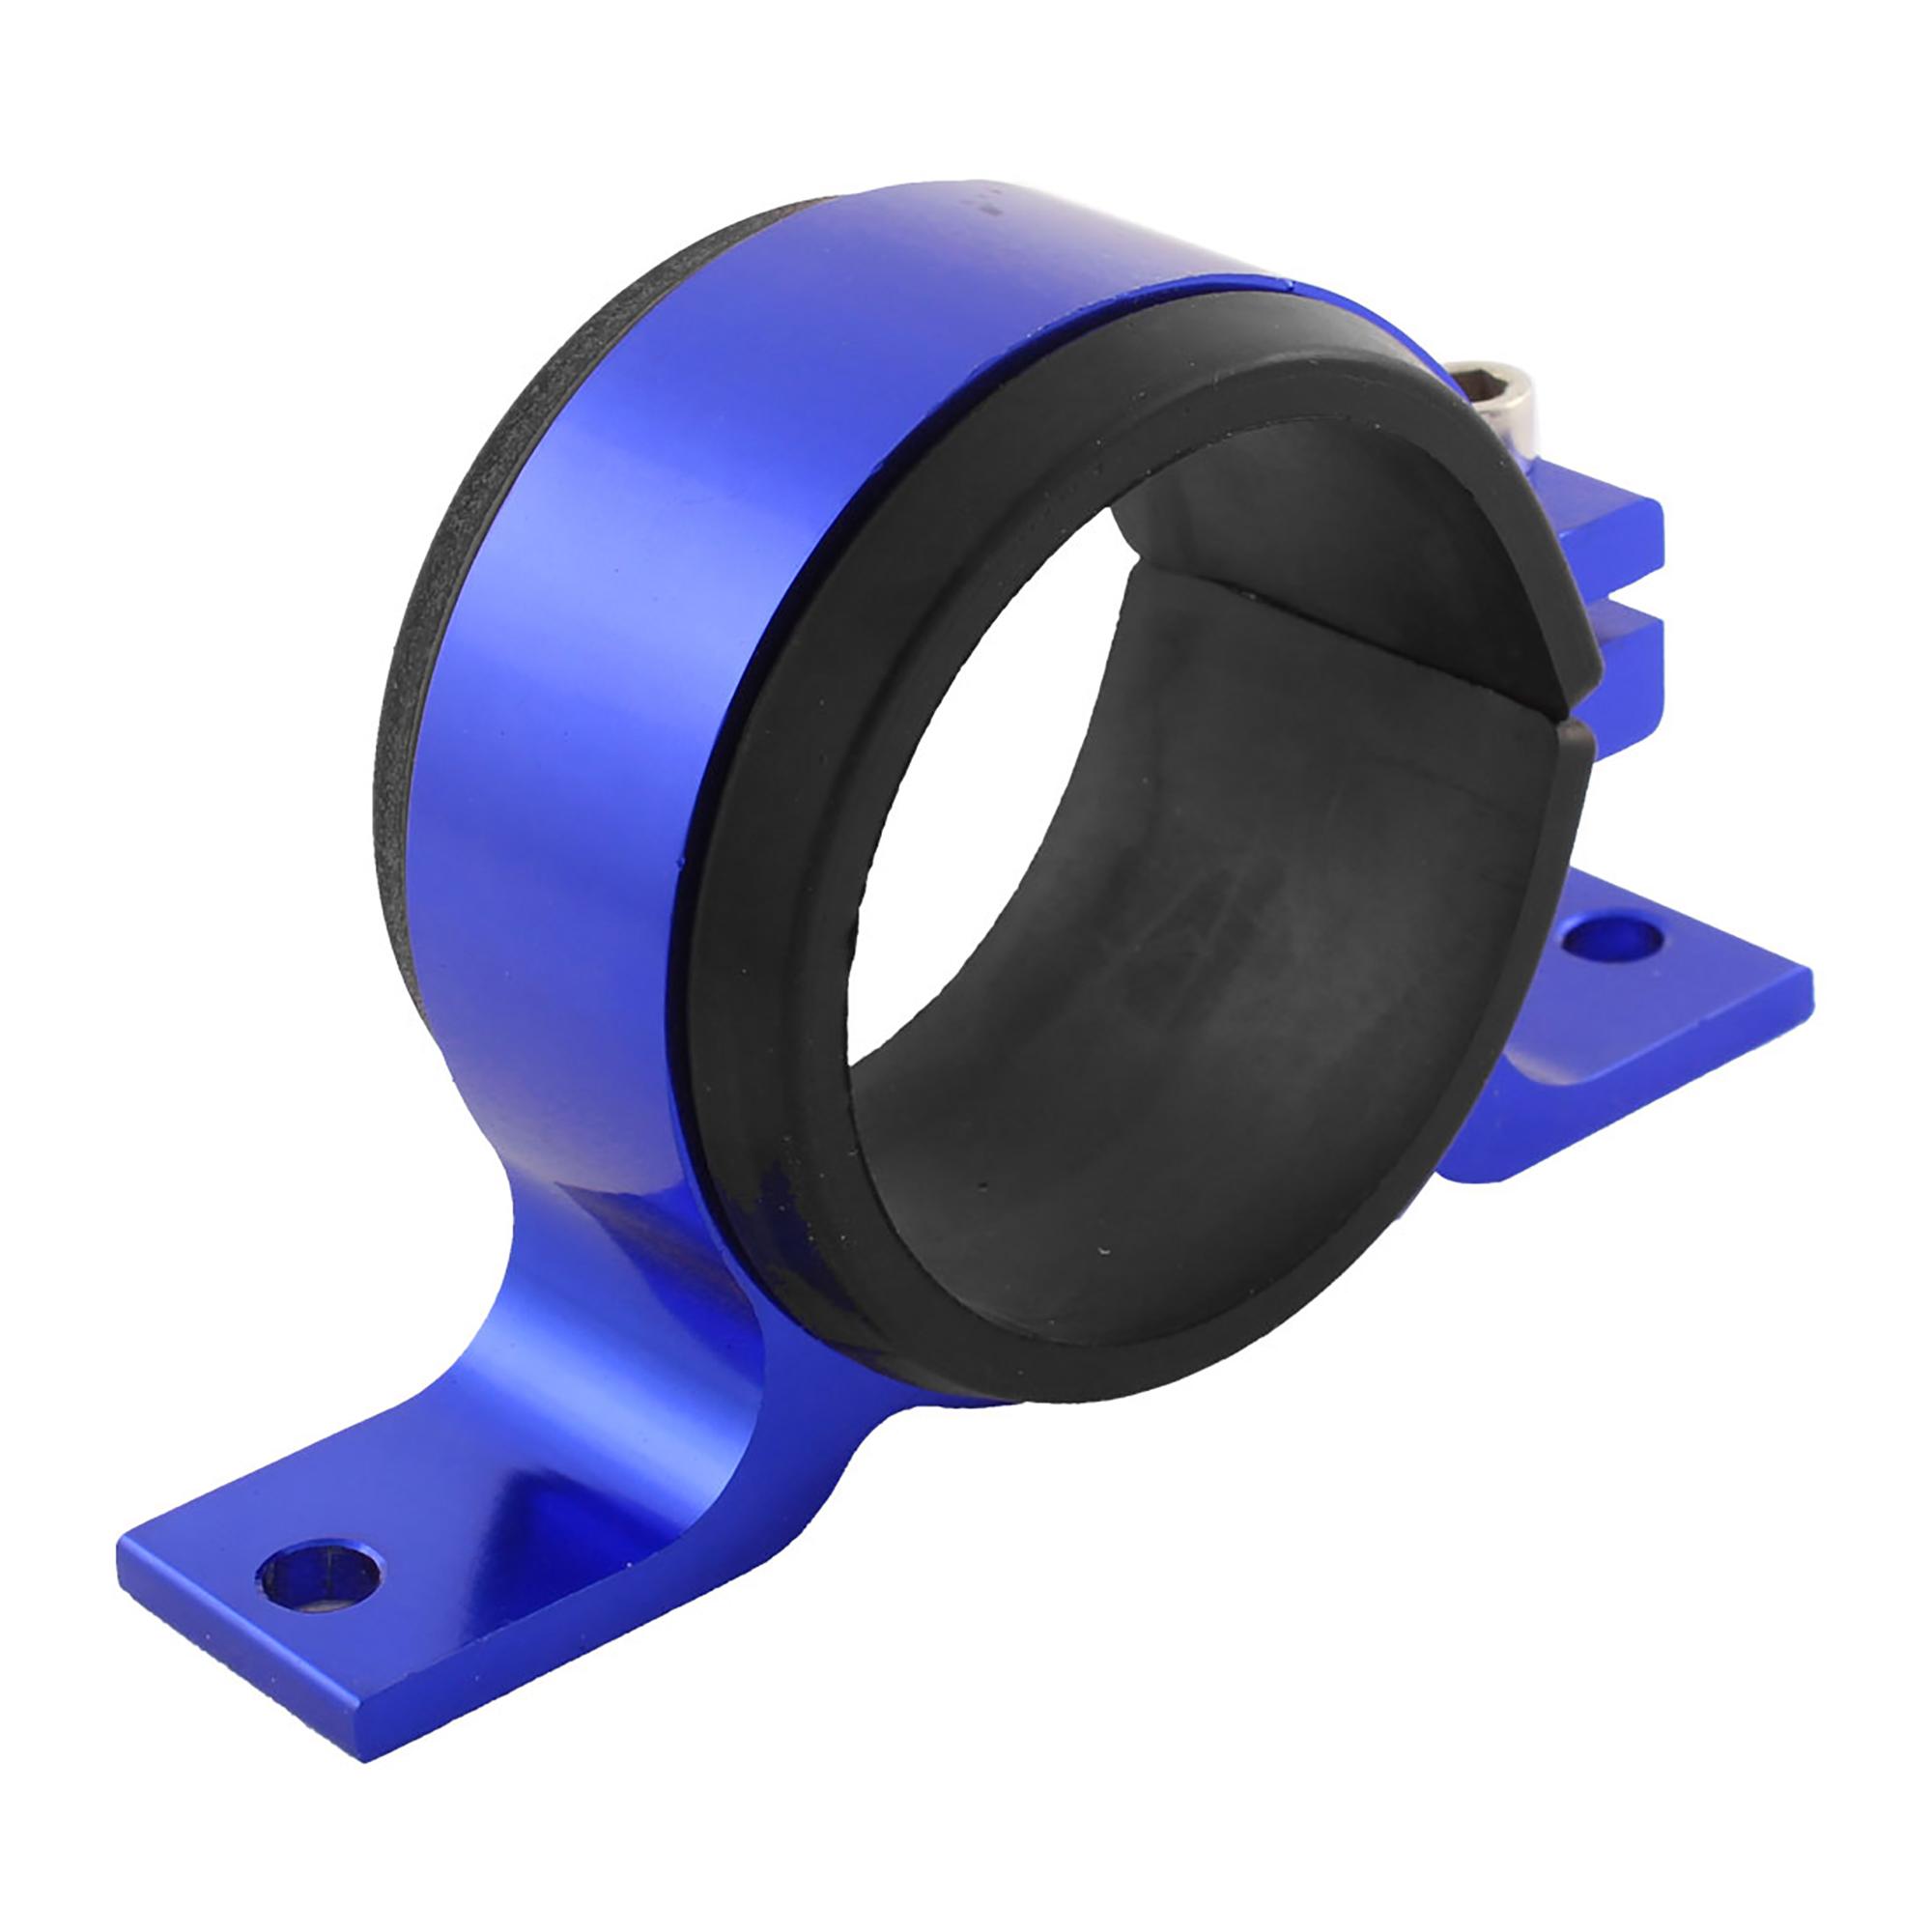 Aluminum 57mm Dia Fuel Pump Mounting Bracket Single Filter Clamp Cradle Blue